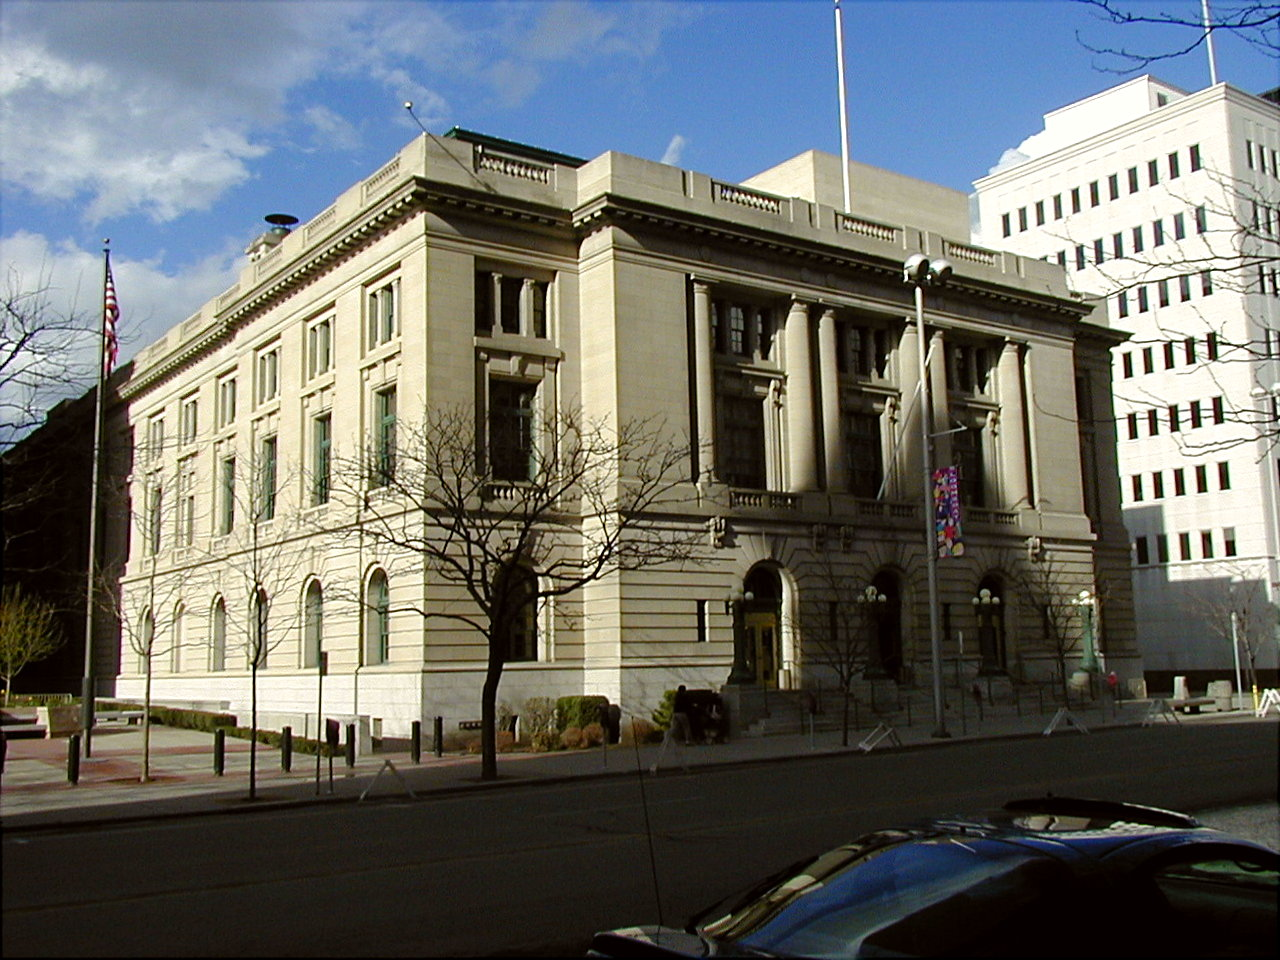 Spokane Federal Court House